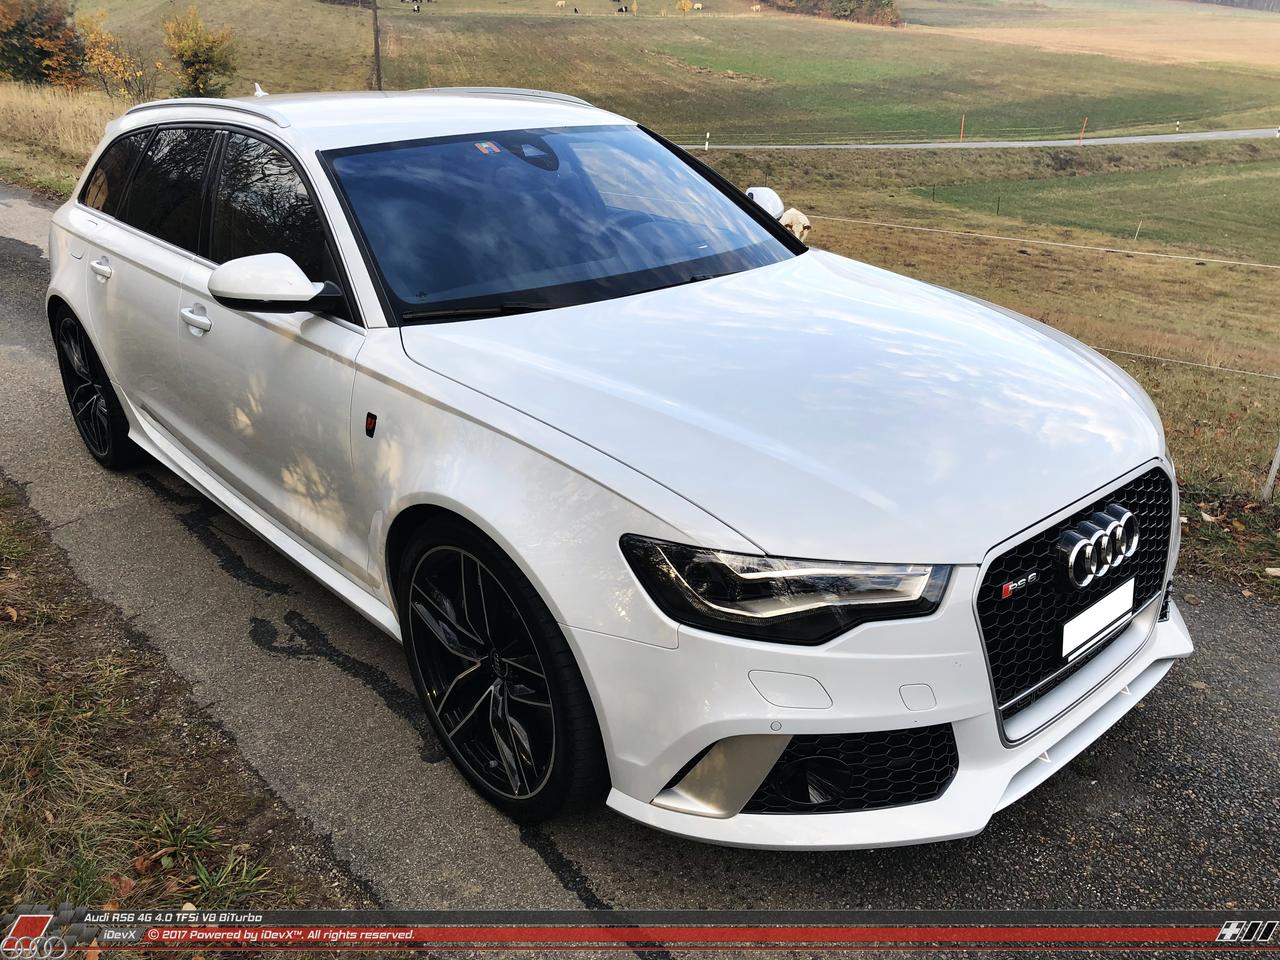 09_11.2018_Audi-RS6_iDevX_005.png